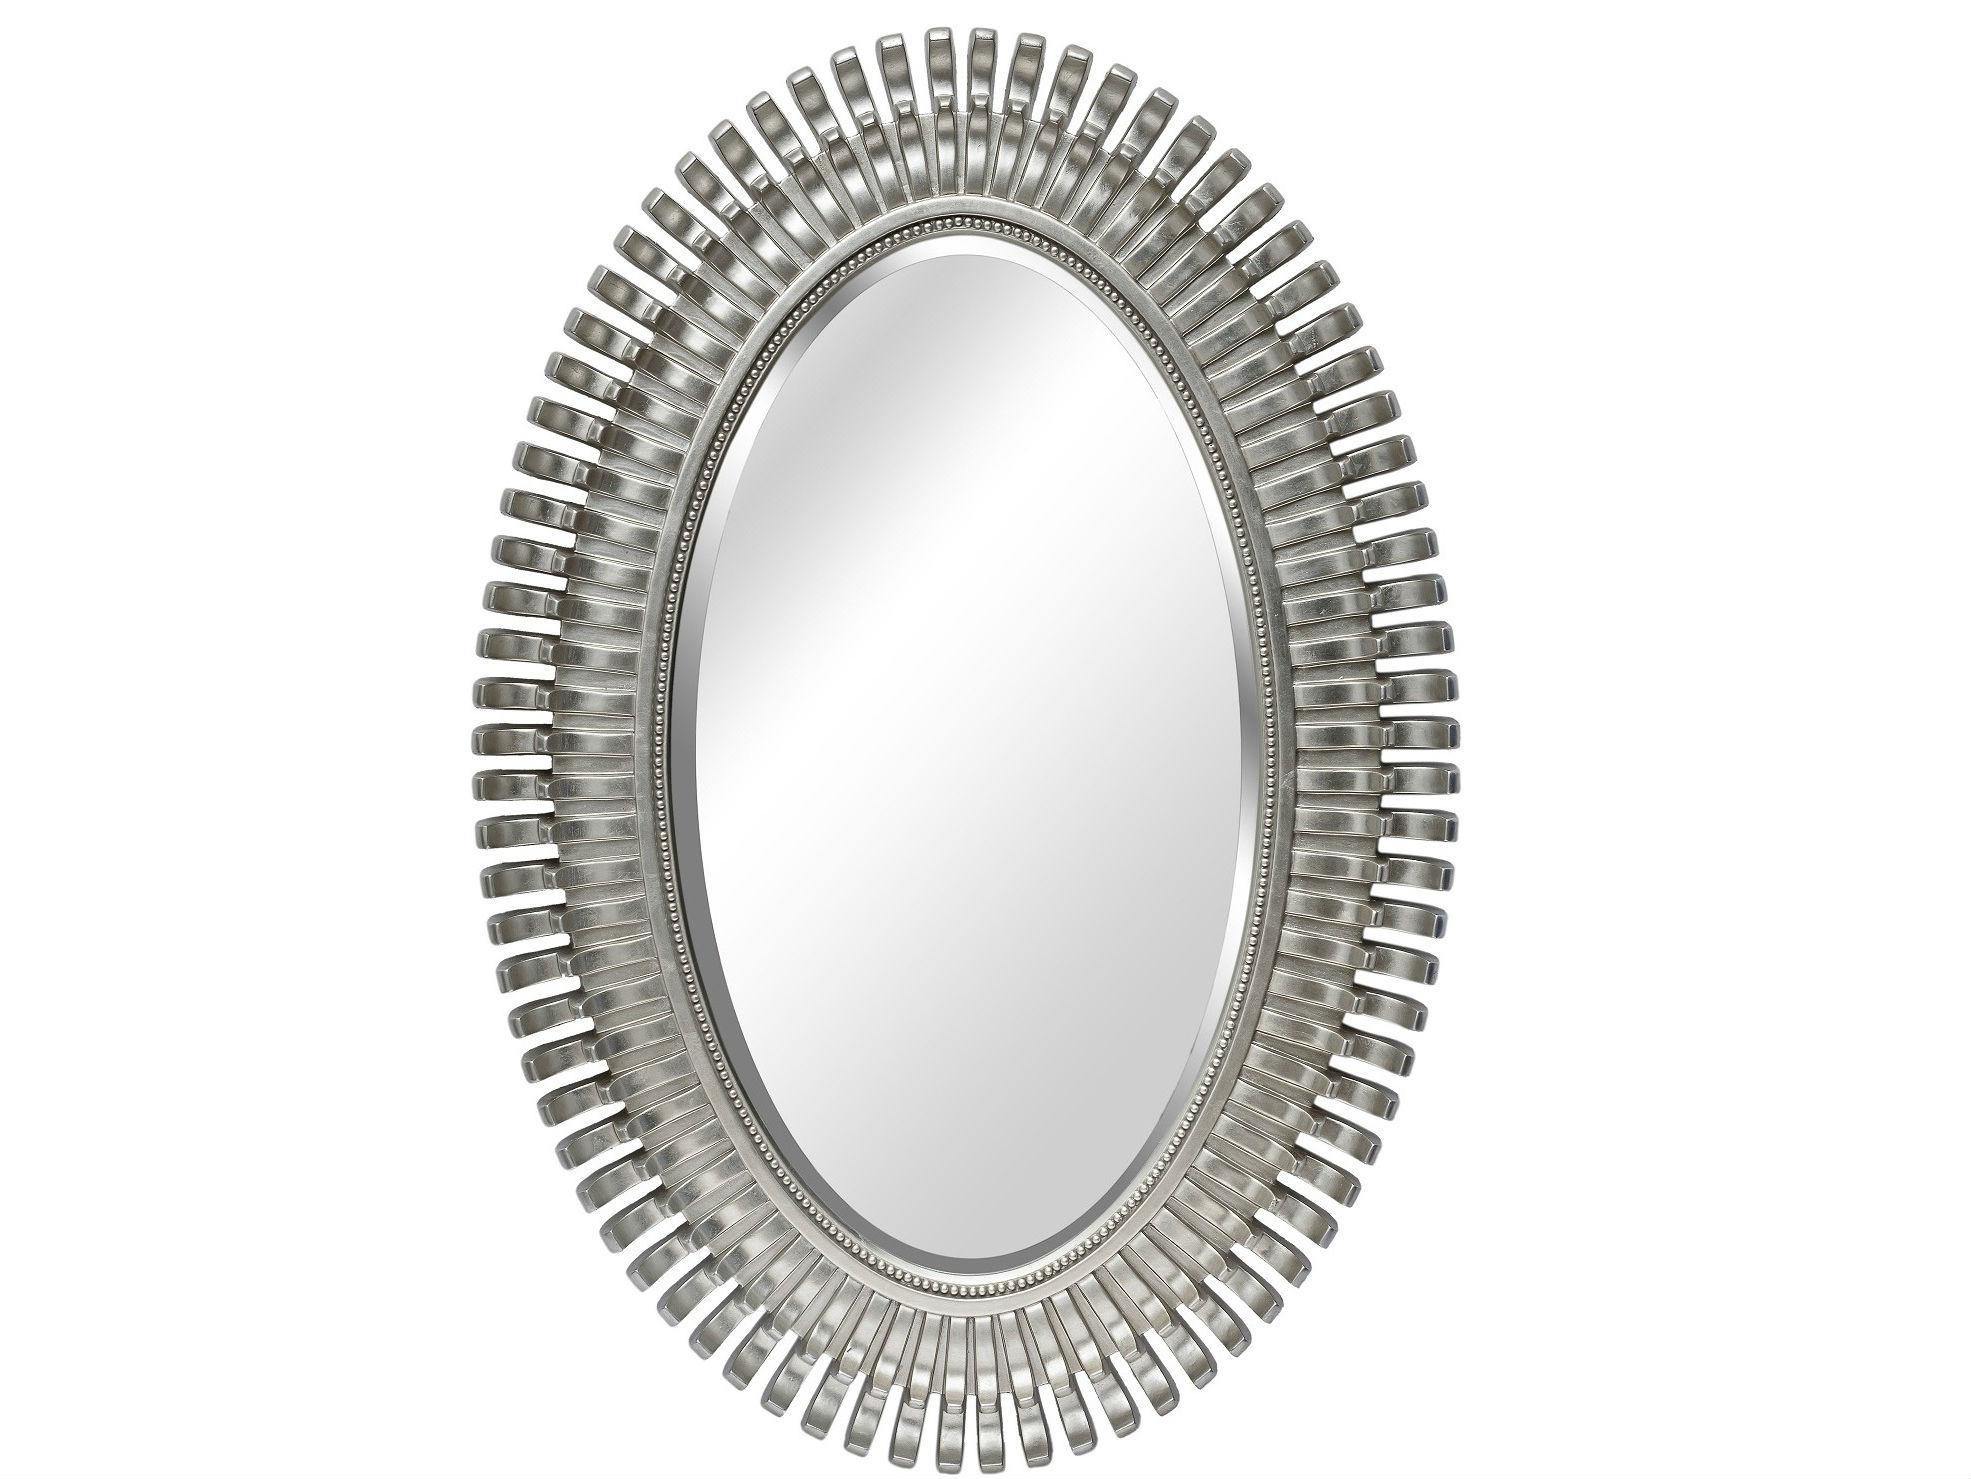 Зеркало AmerindНастенные зеркала<br>Цвет: Серебро<br>Материал: Полиуретан<br><br>Material: Стекло<br>Width см: 76<br>Height см: 112